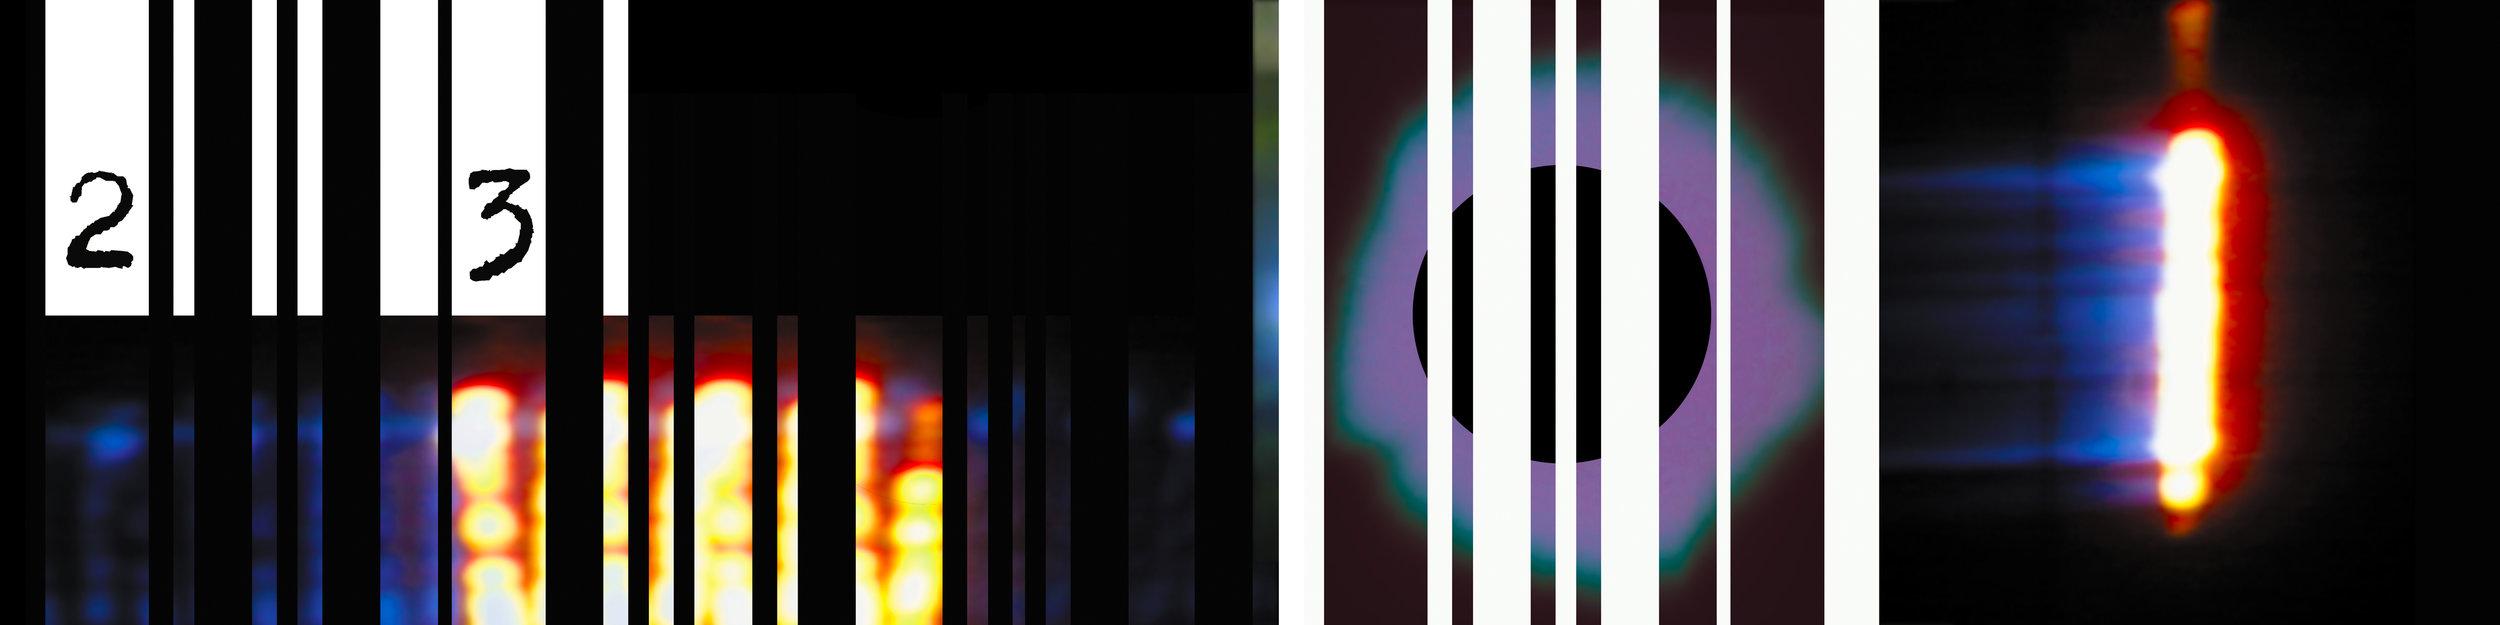 ACIDROCKERS-SPREAD-03APR19-RGB.jpg